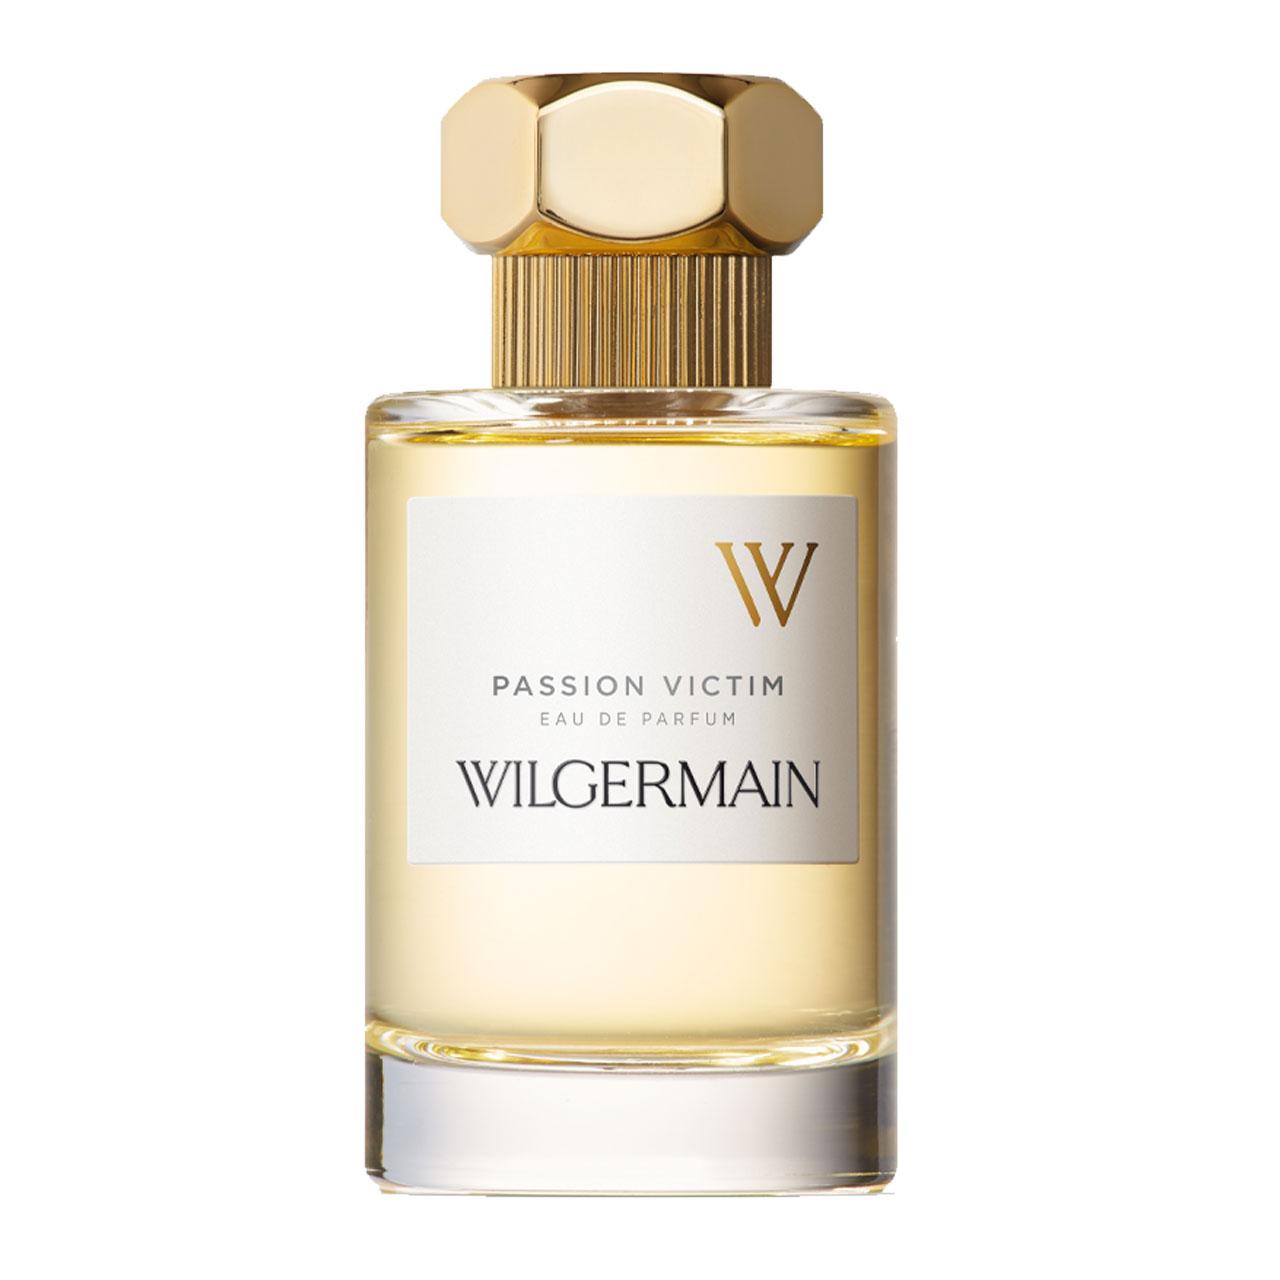 Wilgermain Passion Victim